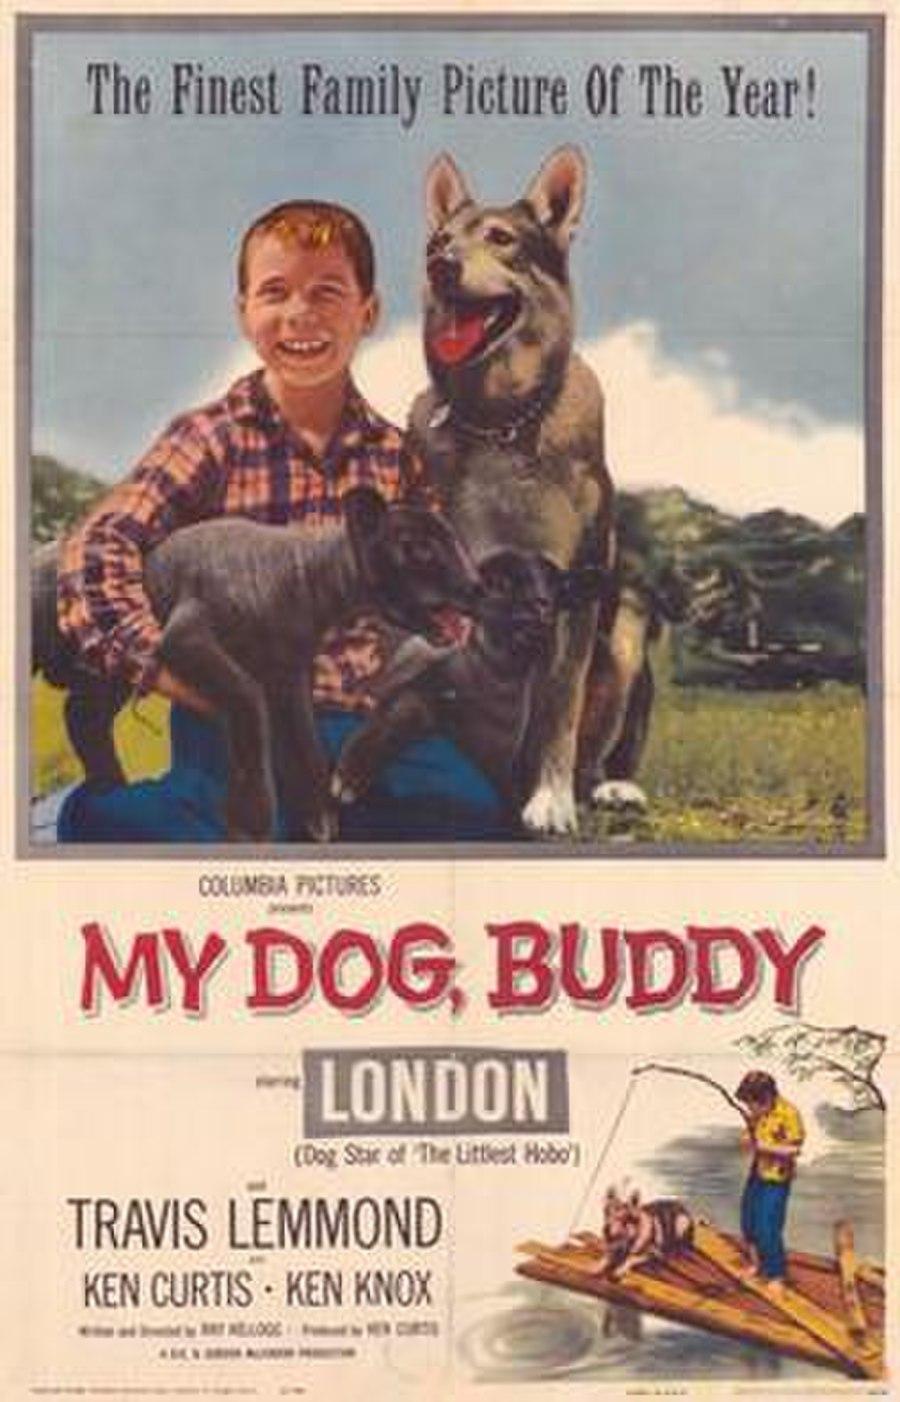 My Dog, Buddy